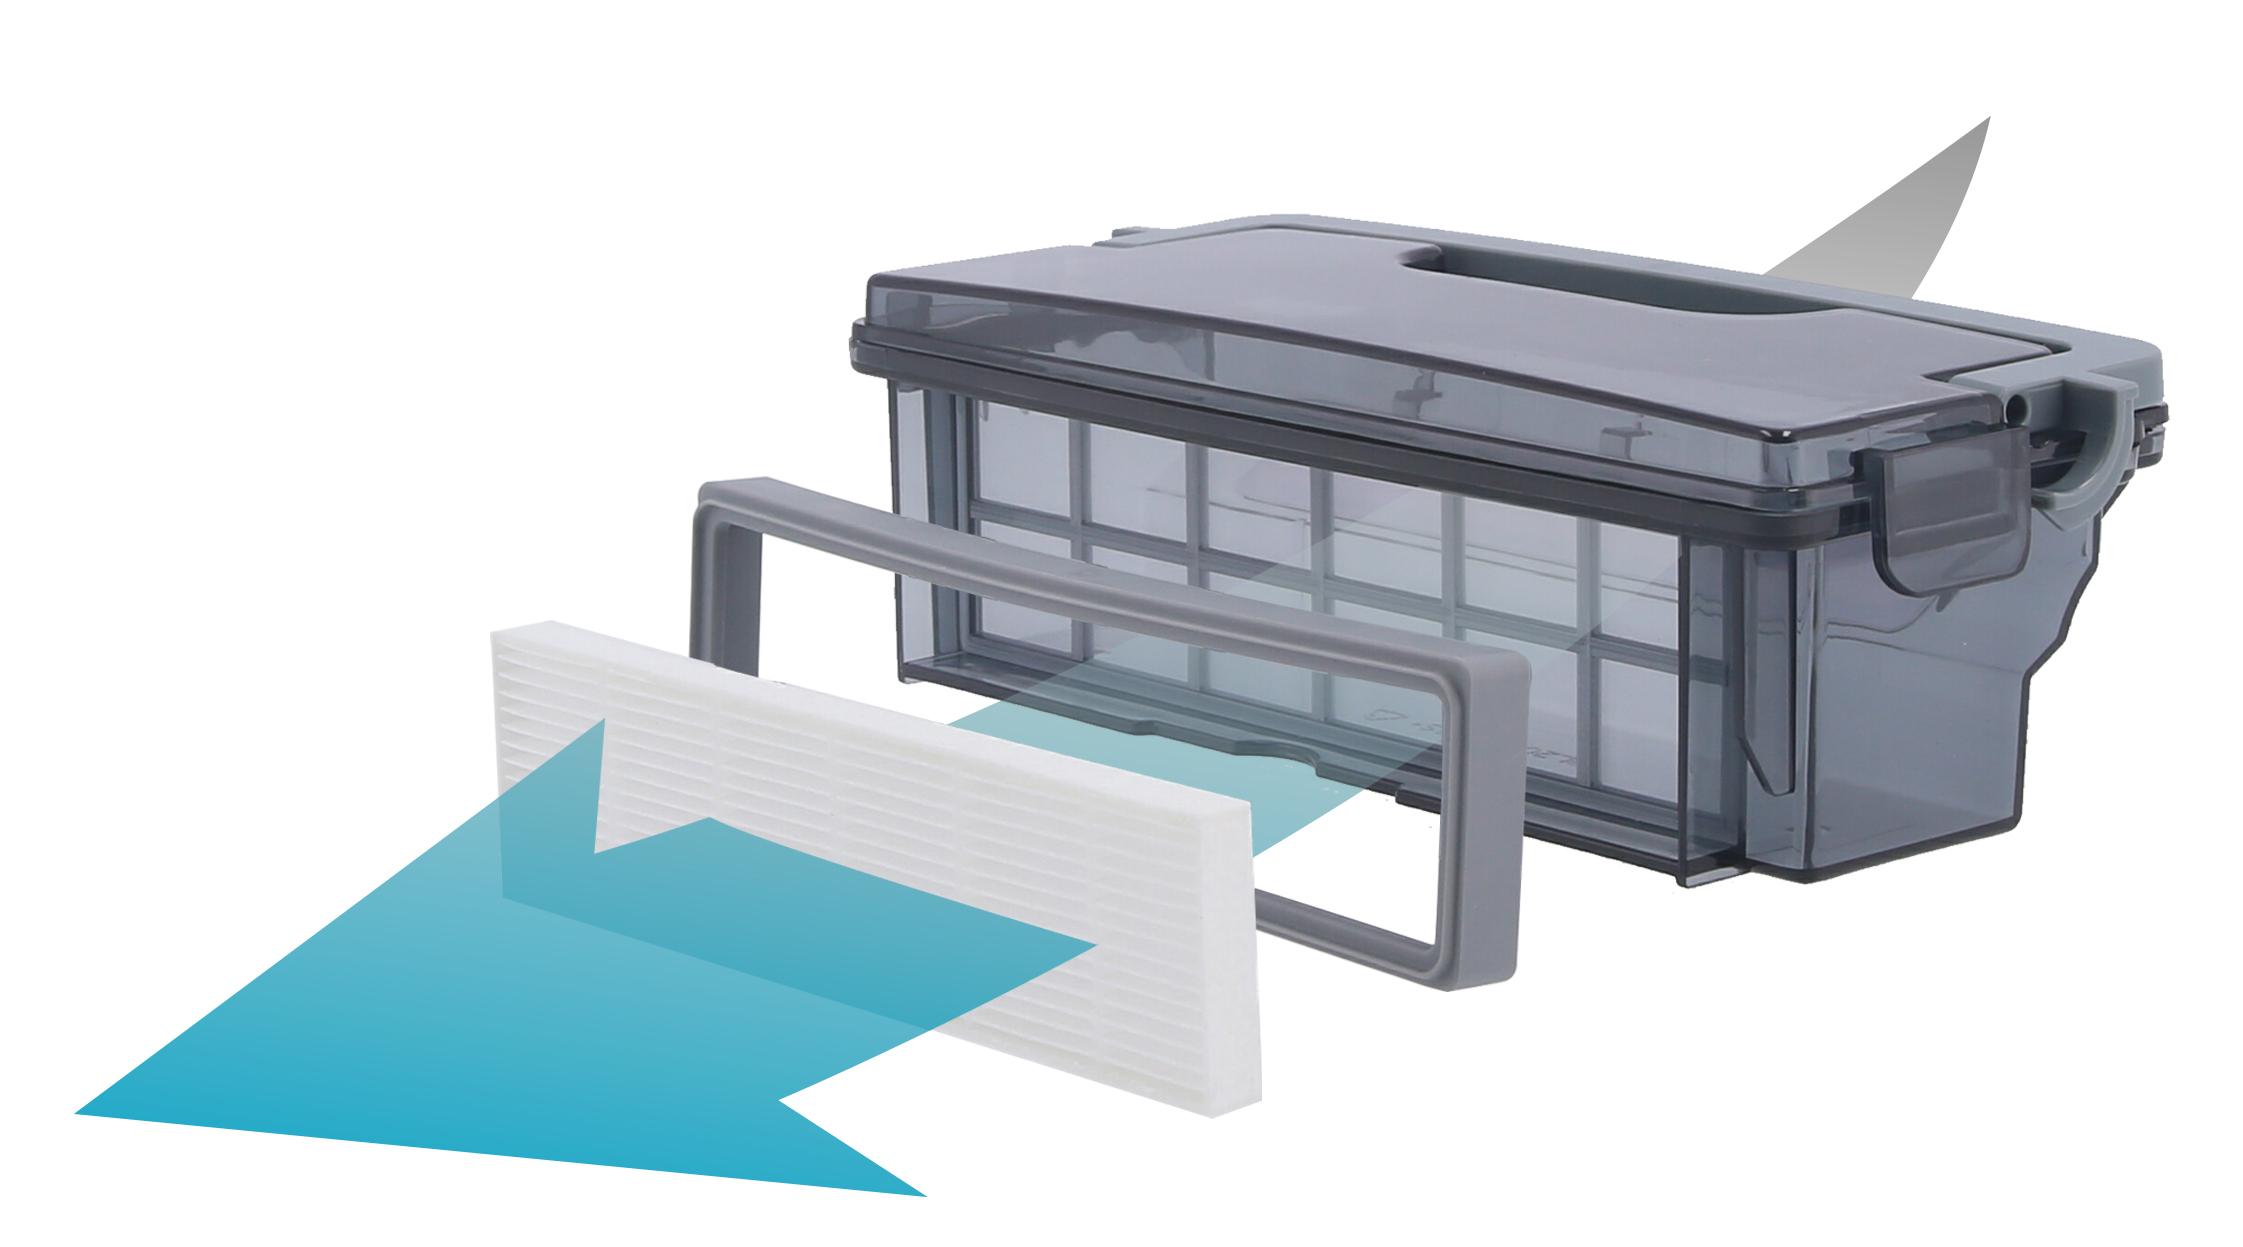 Robot aspirateur AMIBOT Prime 2 filtration efficace HEPA